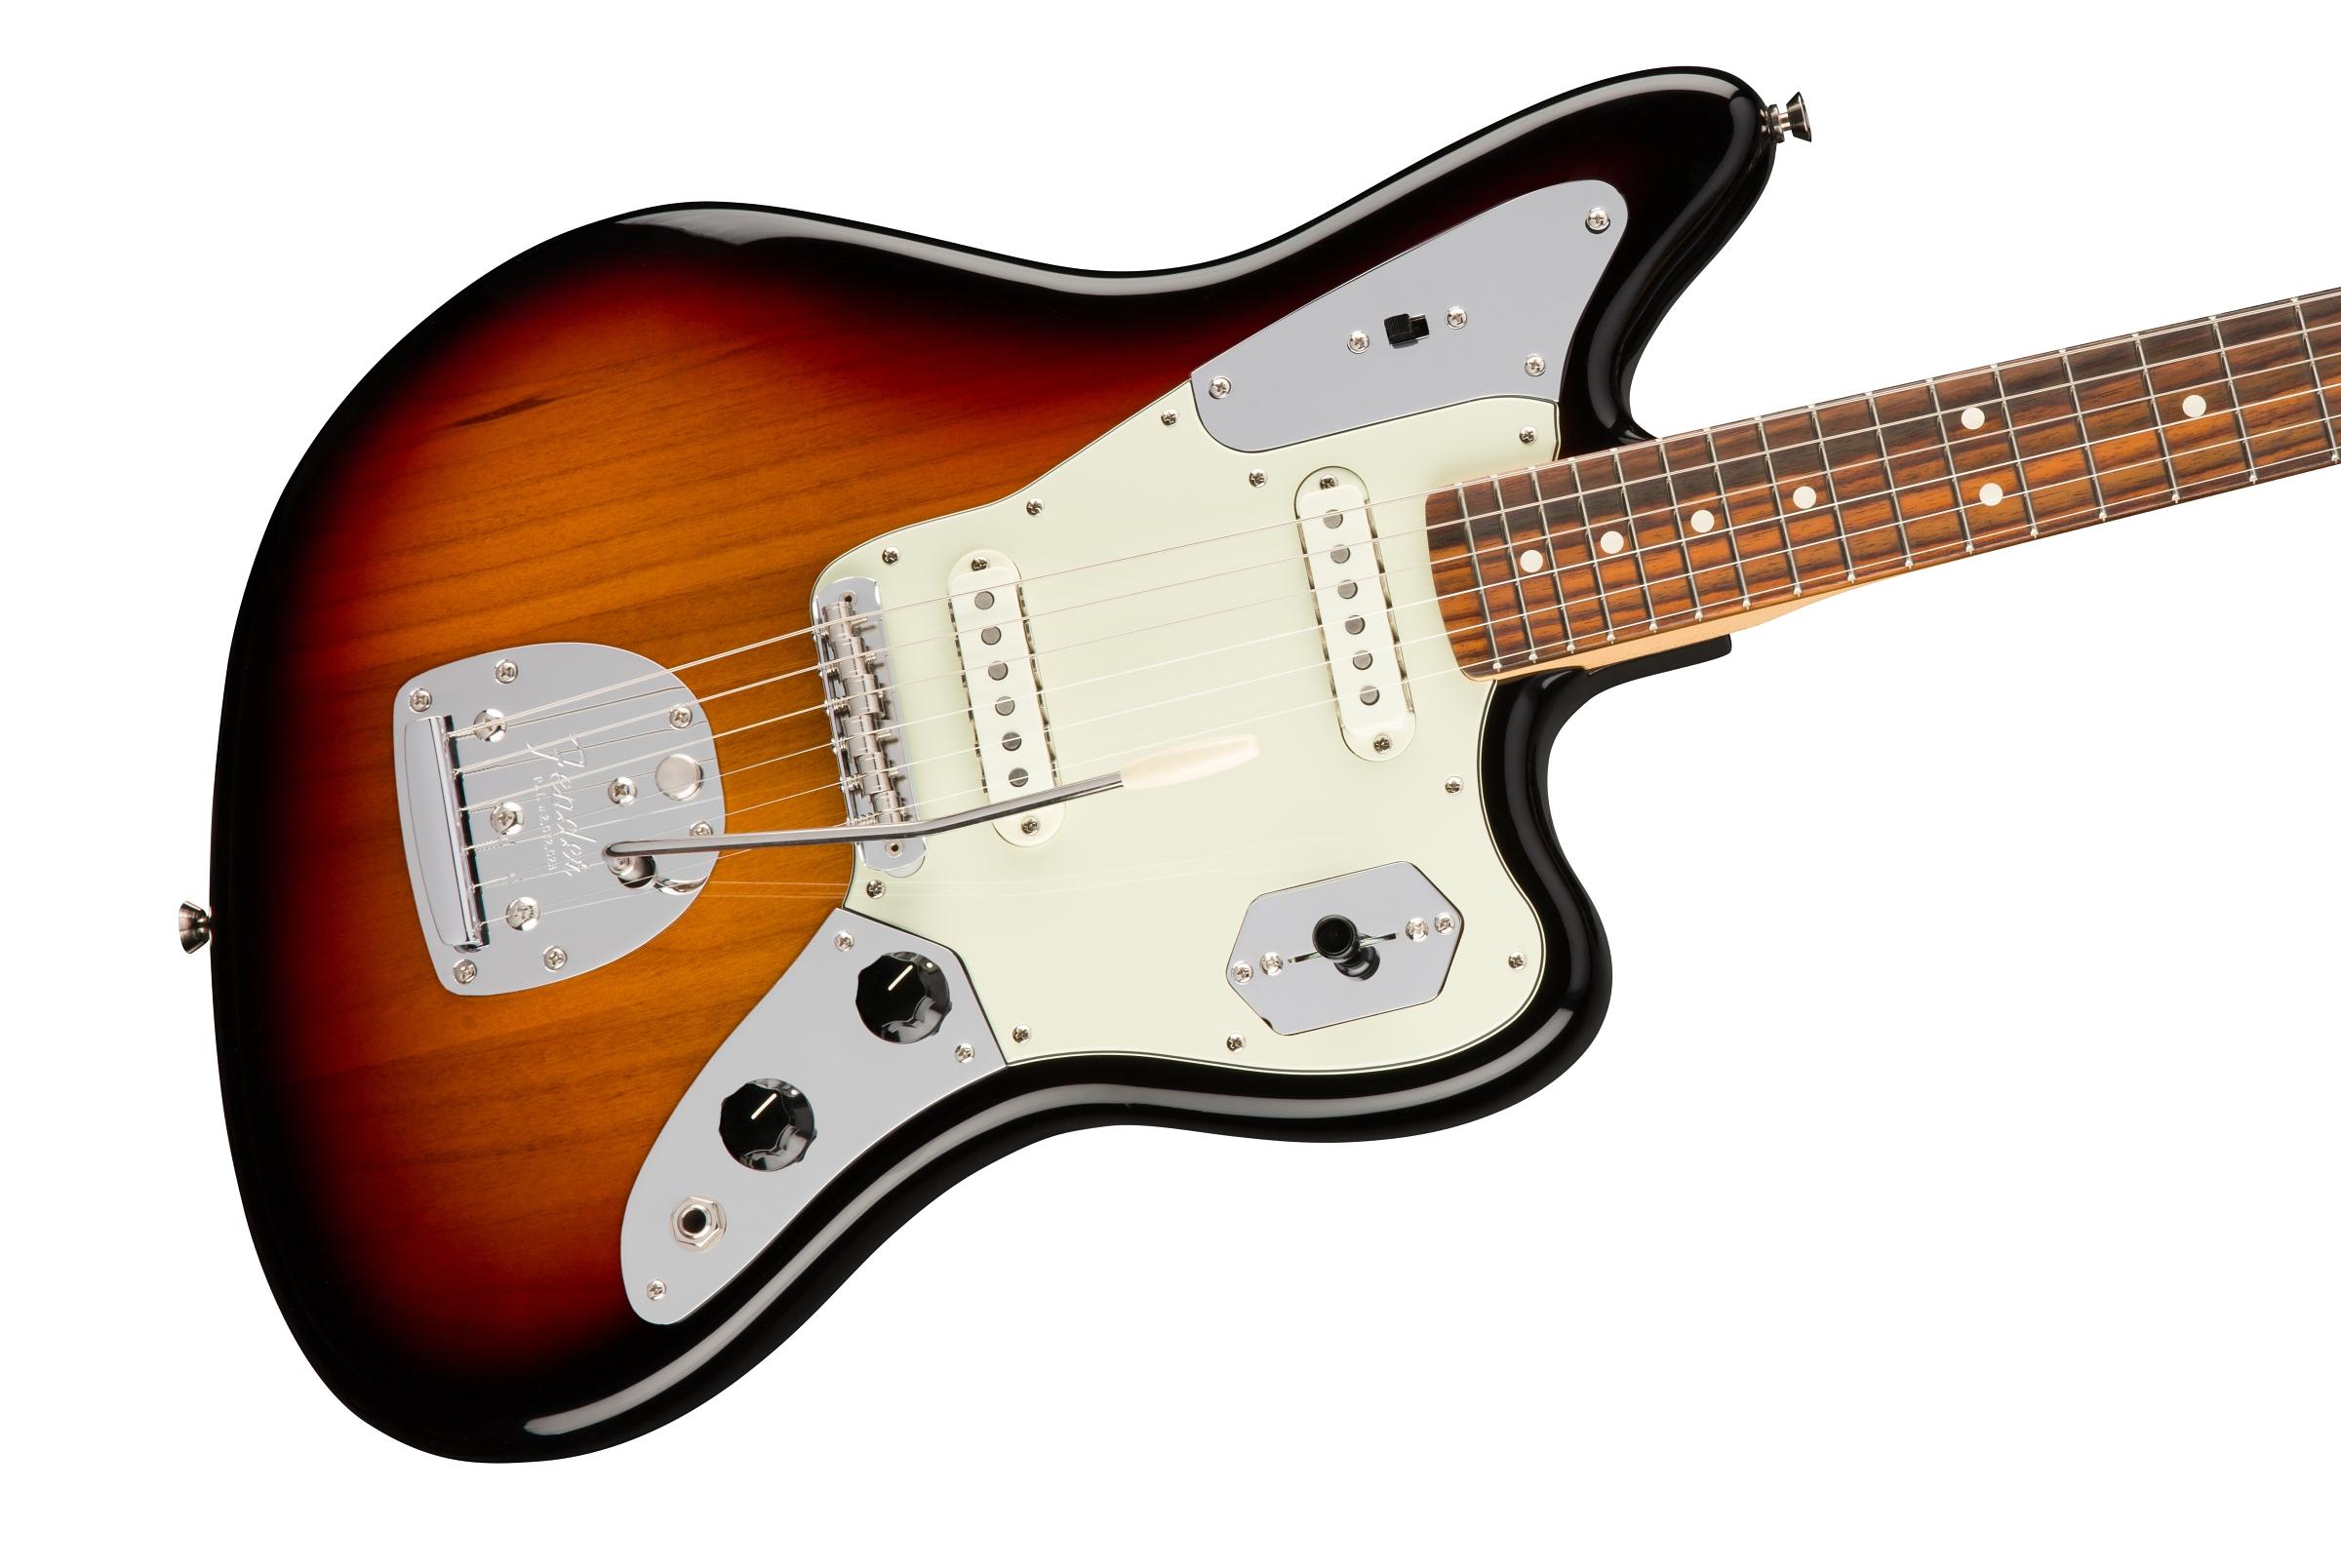 Fender American Pro Jaguar 174 Rosewood Fingerboard 3 Color